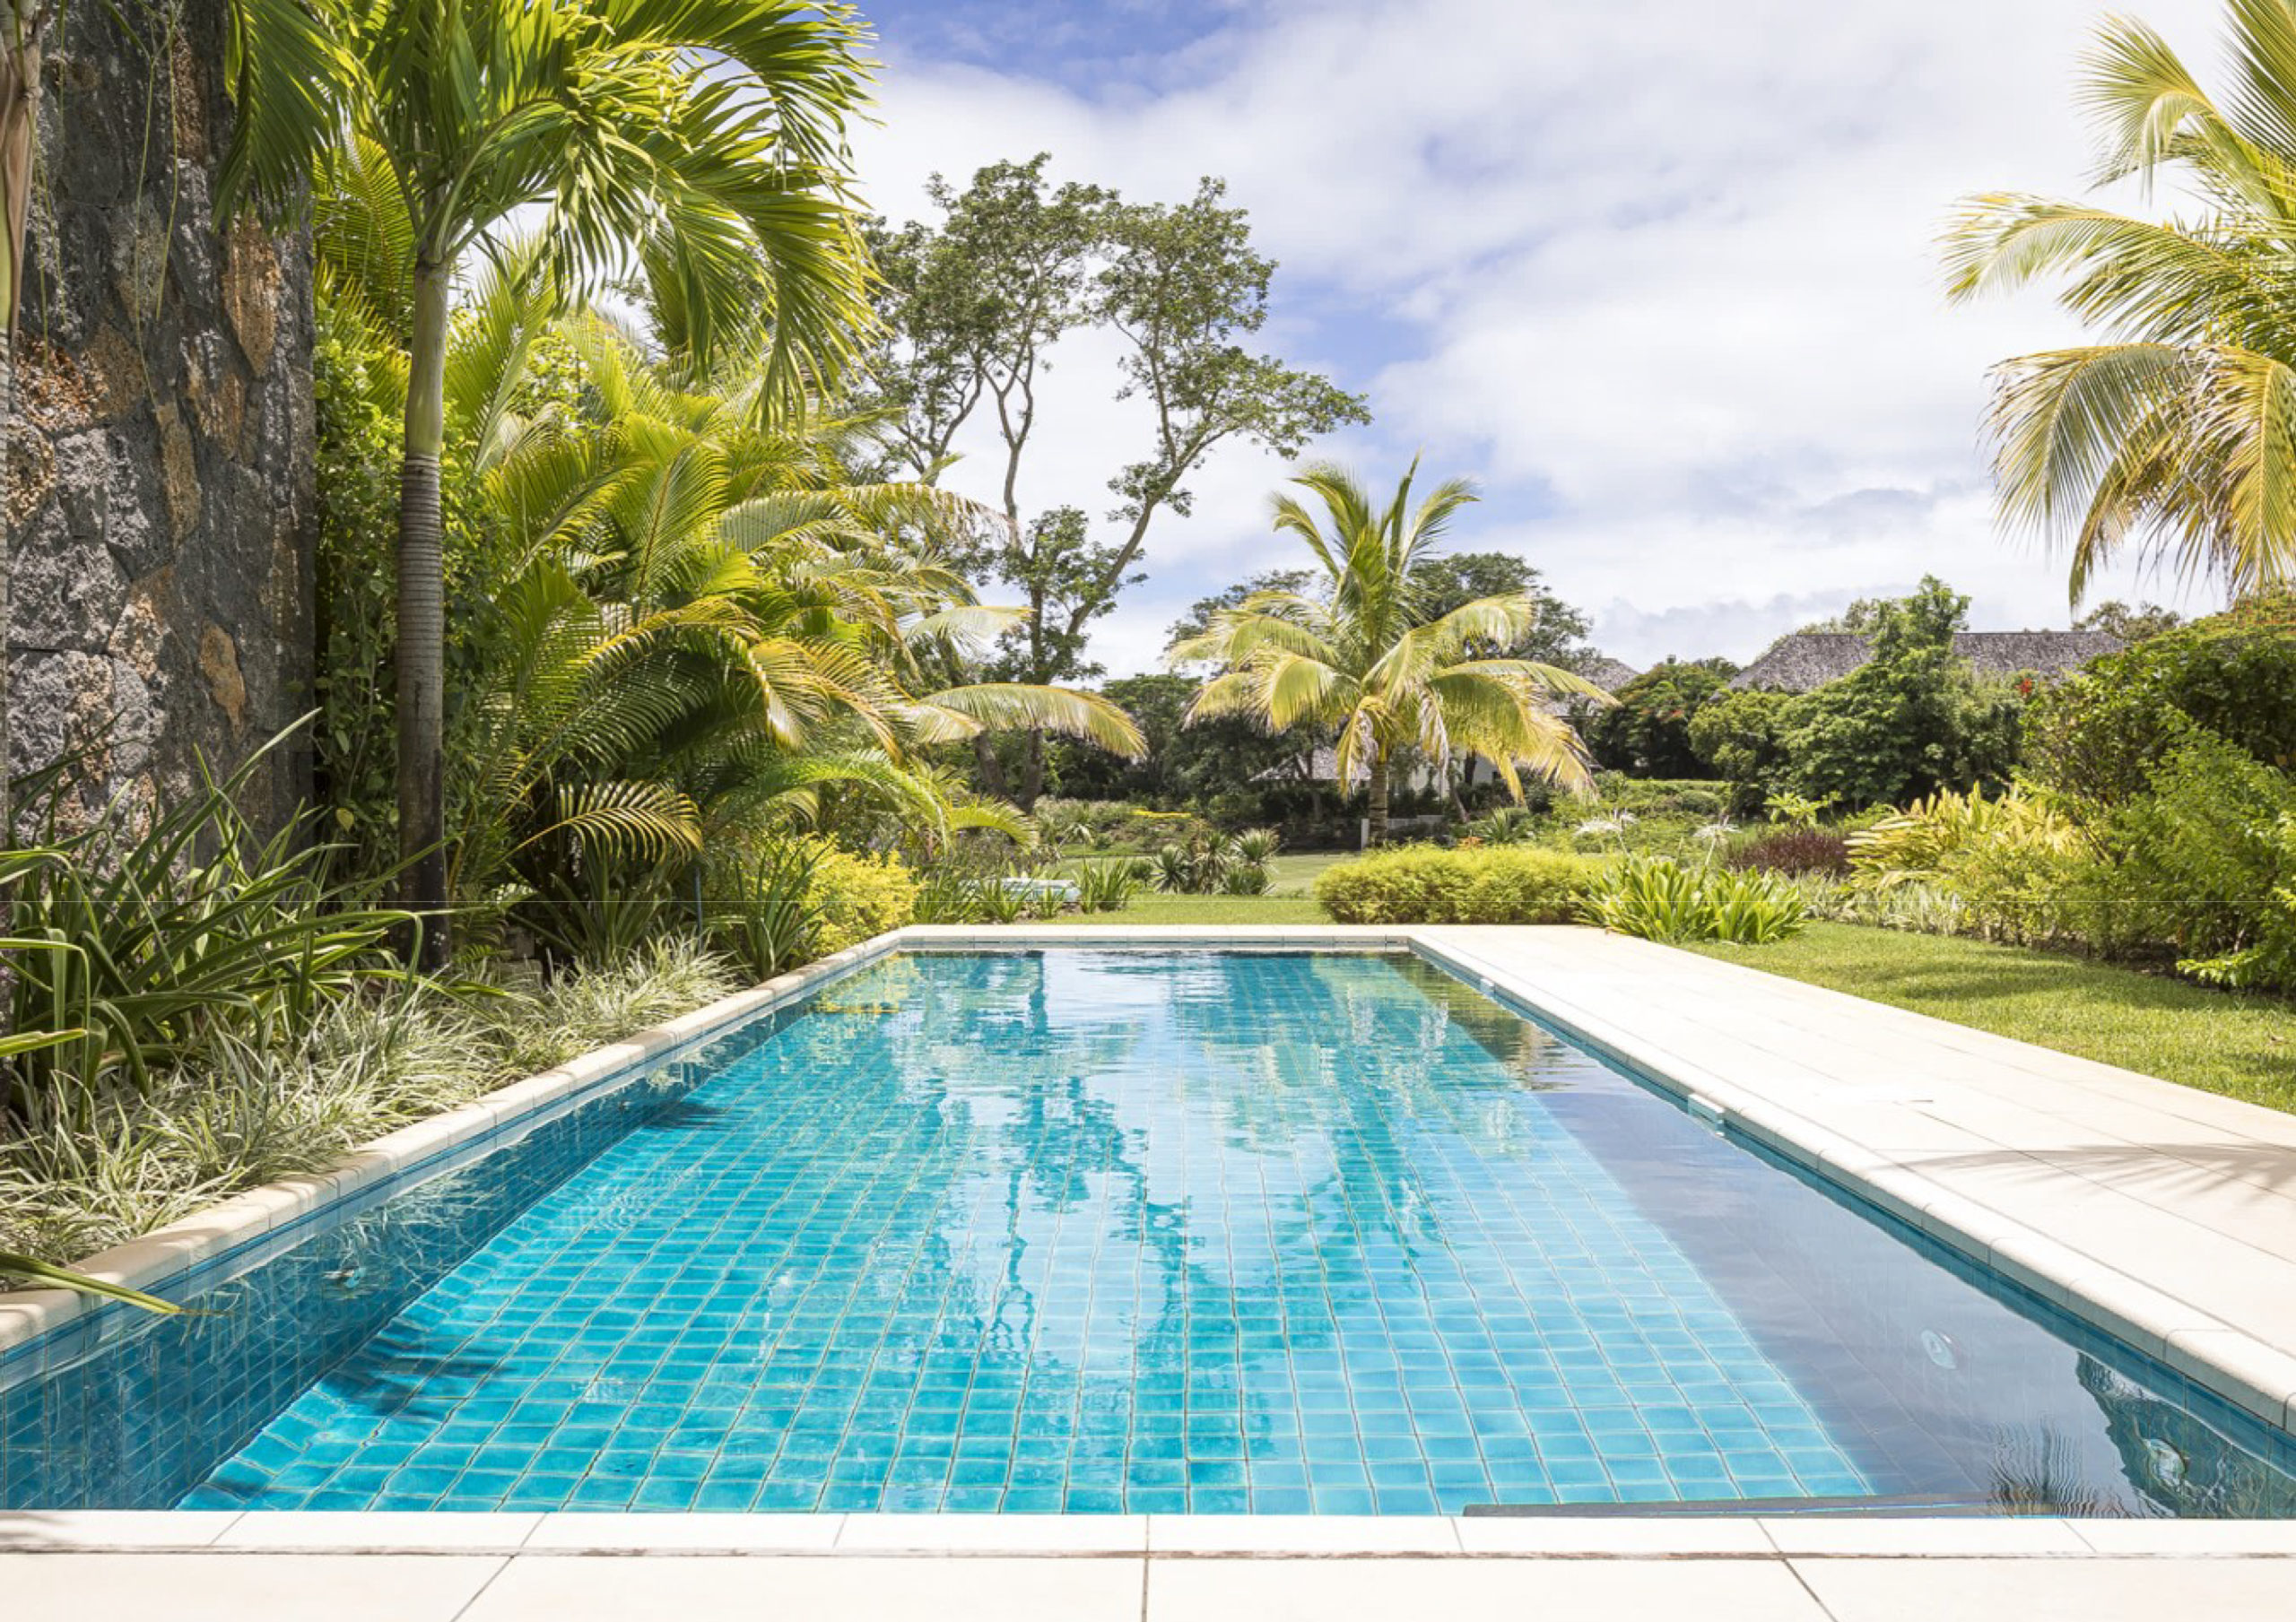 Villa jumelée IRS 3 chambres Île Maurice